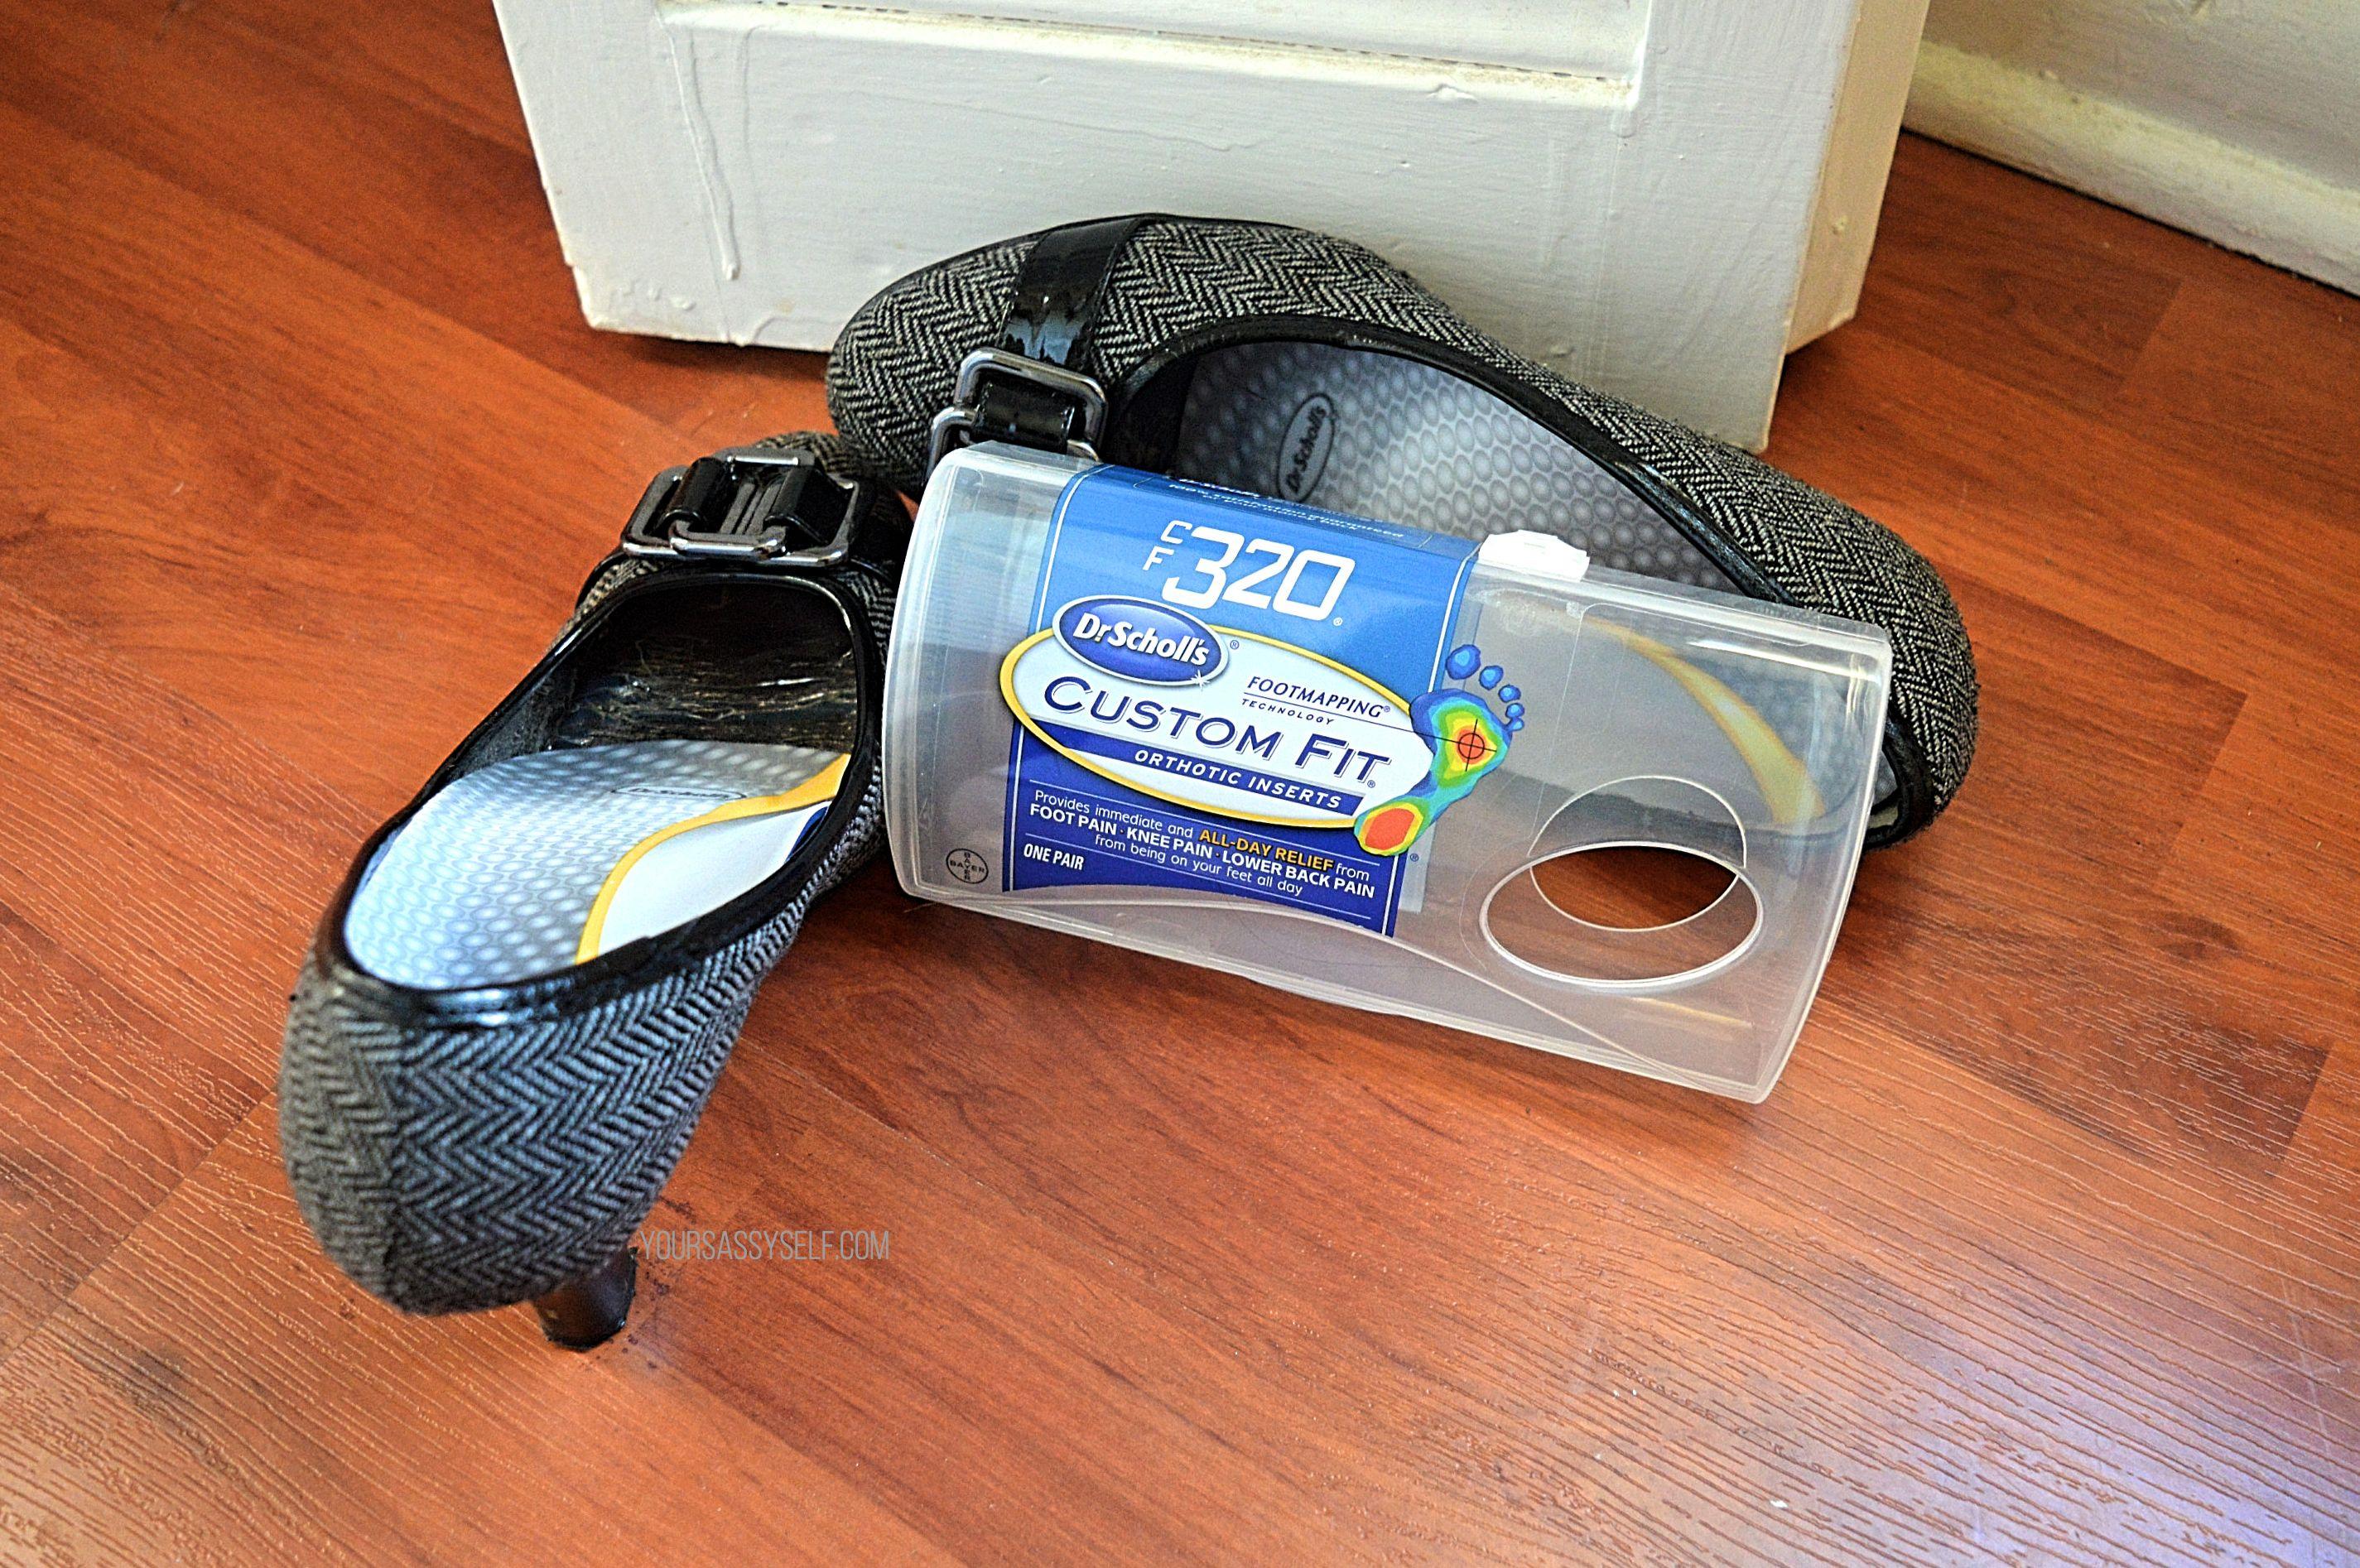 CF320 Custom Fit® Orthotics in High Heels - yoursassyselfcom